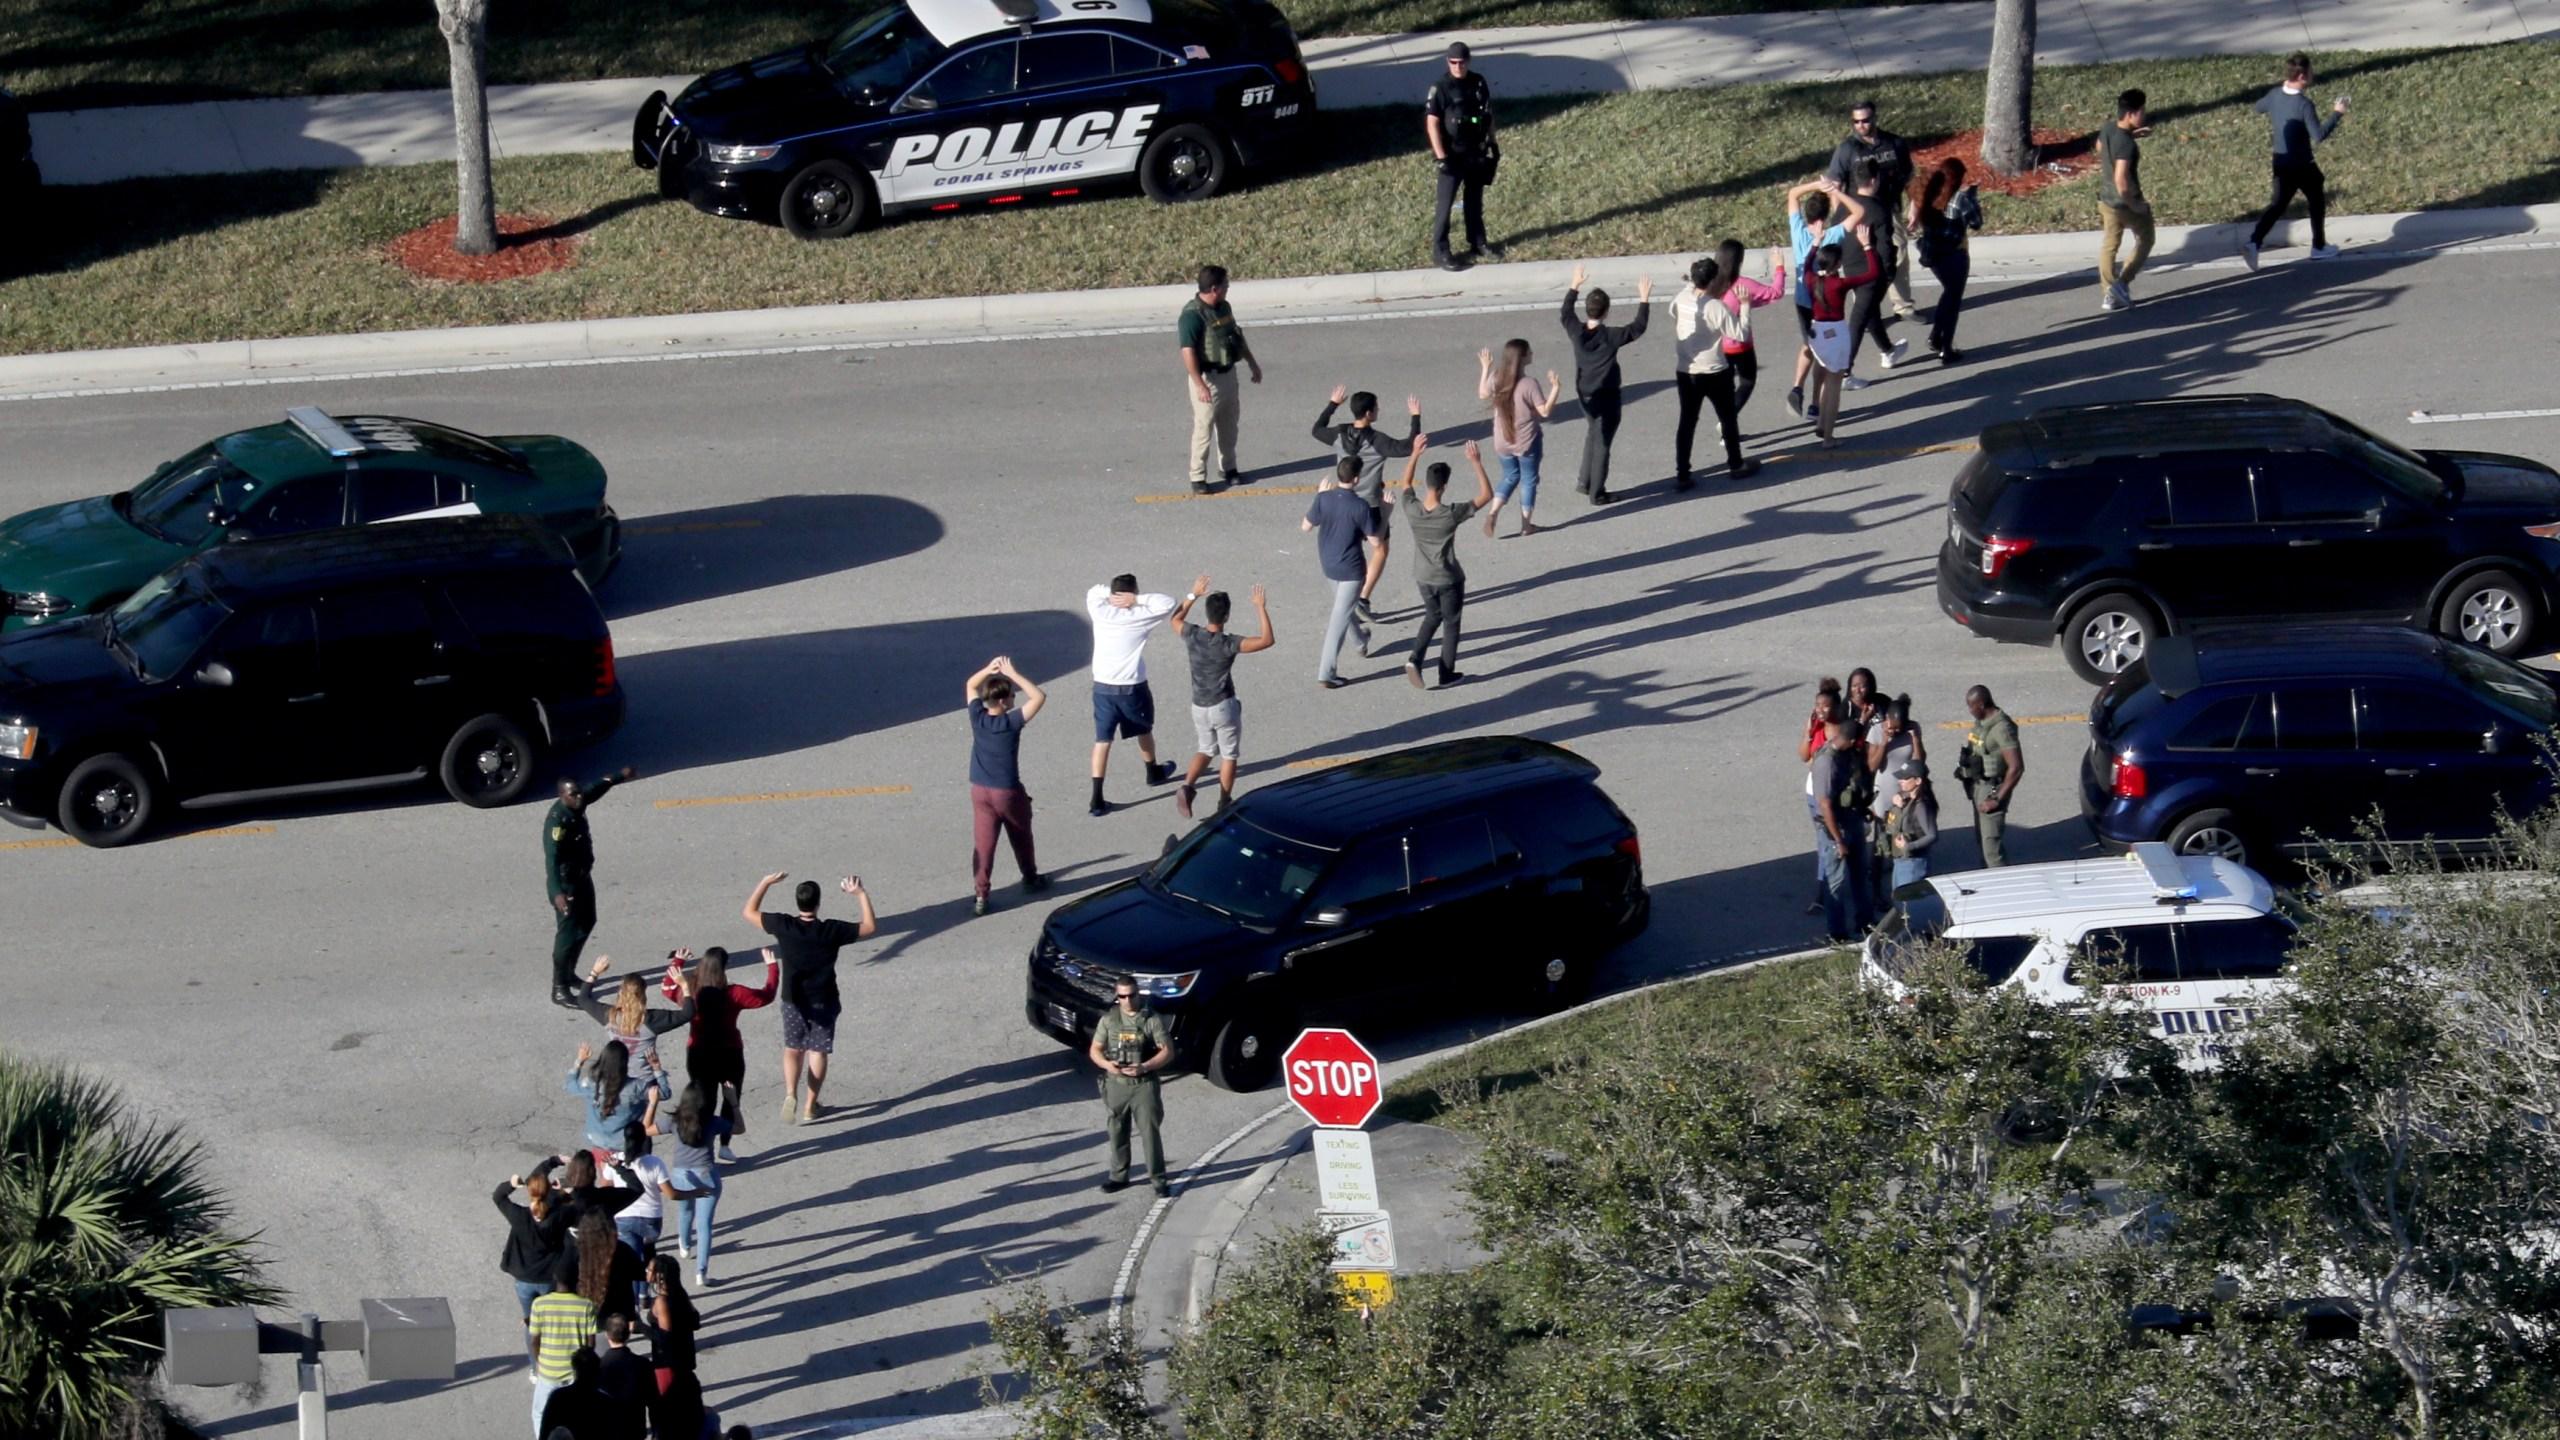 Florida_School_Shooting_911_Calls_05053-159532.jpg22873935